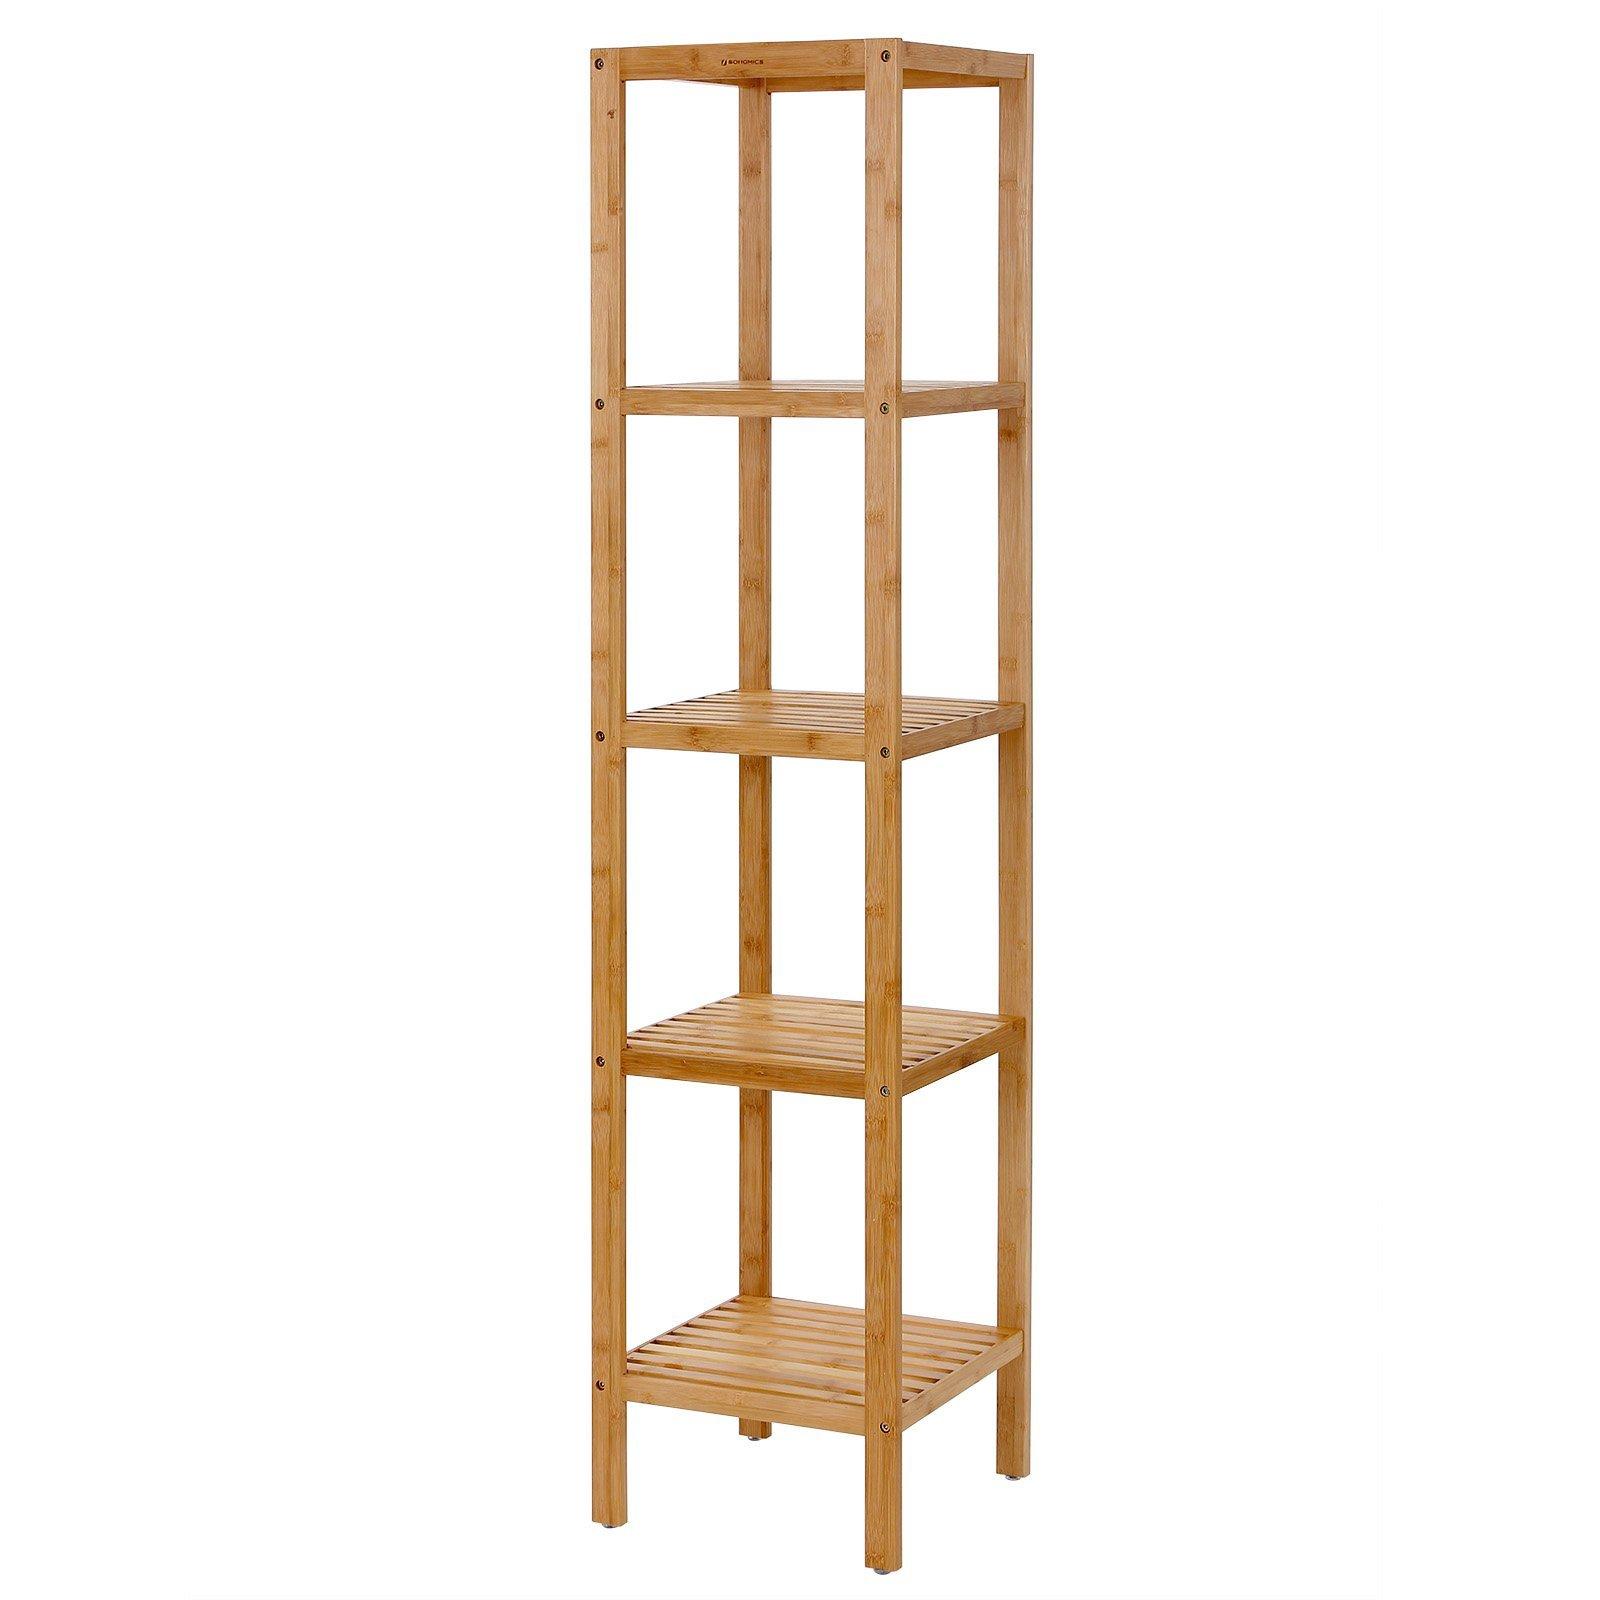 SONGMICS Narrow Shelving Unit Bathroom Shelf 5-Tier Multifunctional Storage Rack 100% Bamboo Wood Corner Rack for Kitchen Livingroom Bedroom UBCB55Y